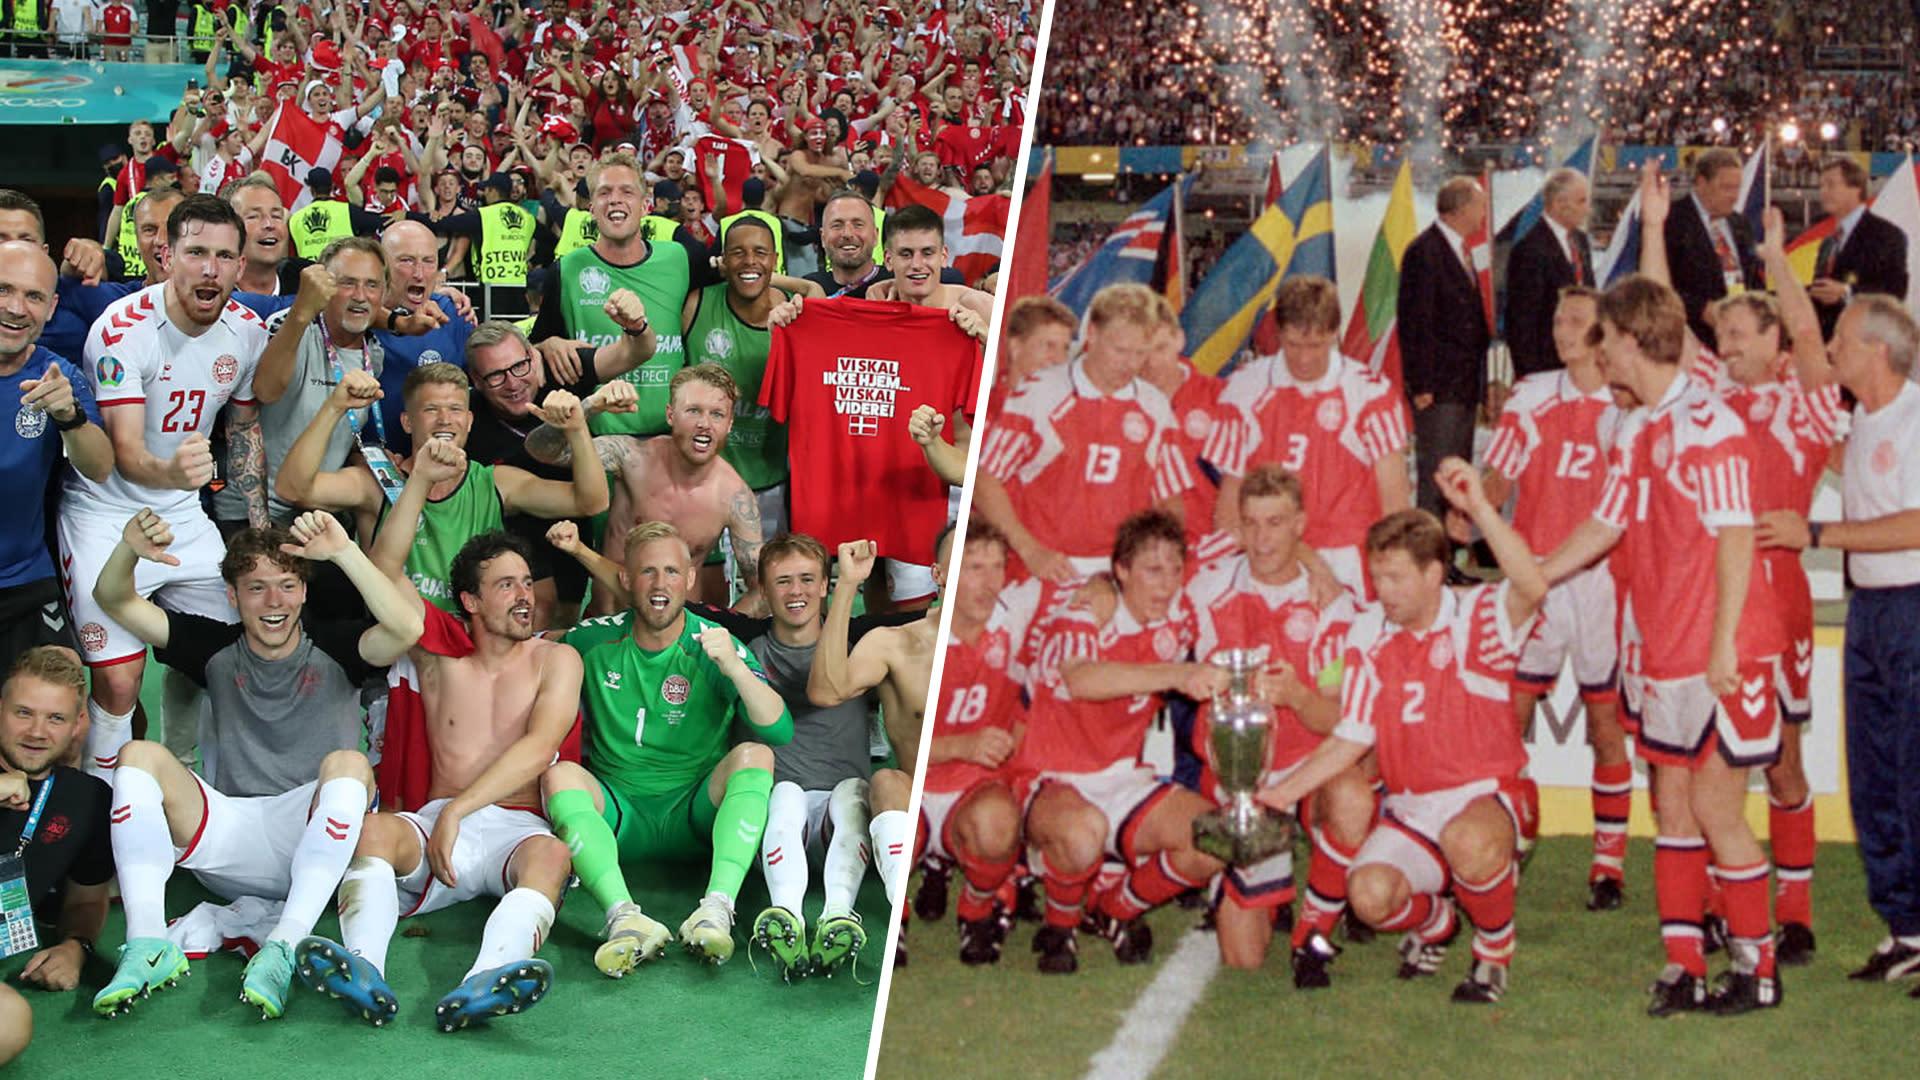 Tanskan jalkapallomaajoukkue EM-kisoissa 2021 ja 1992